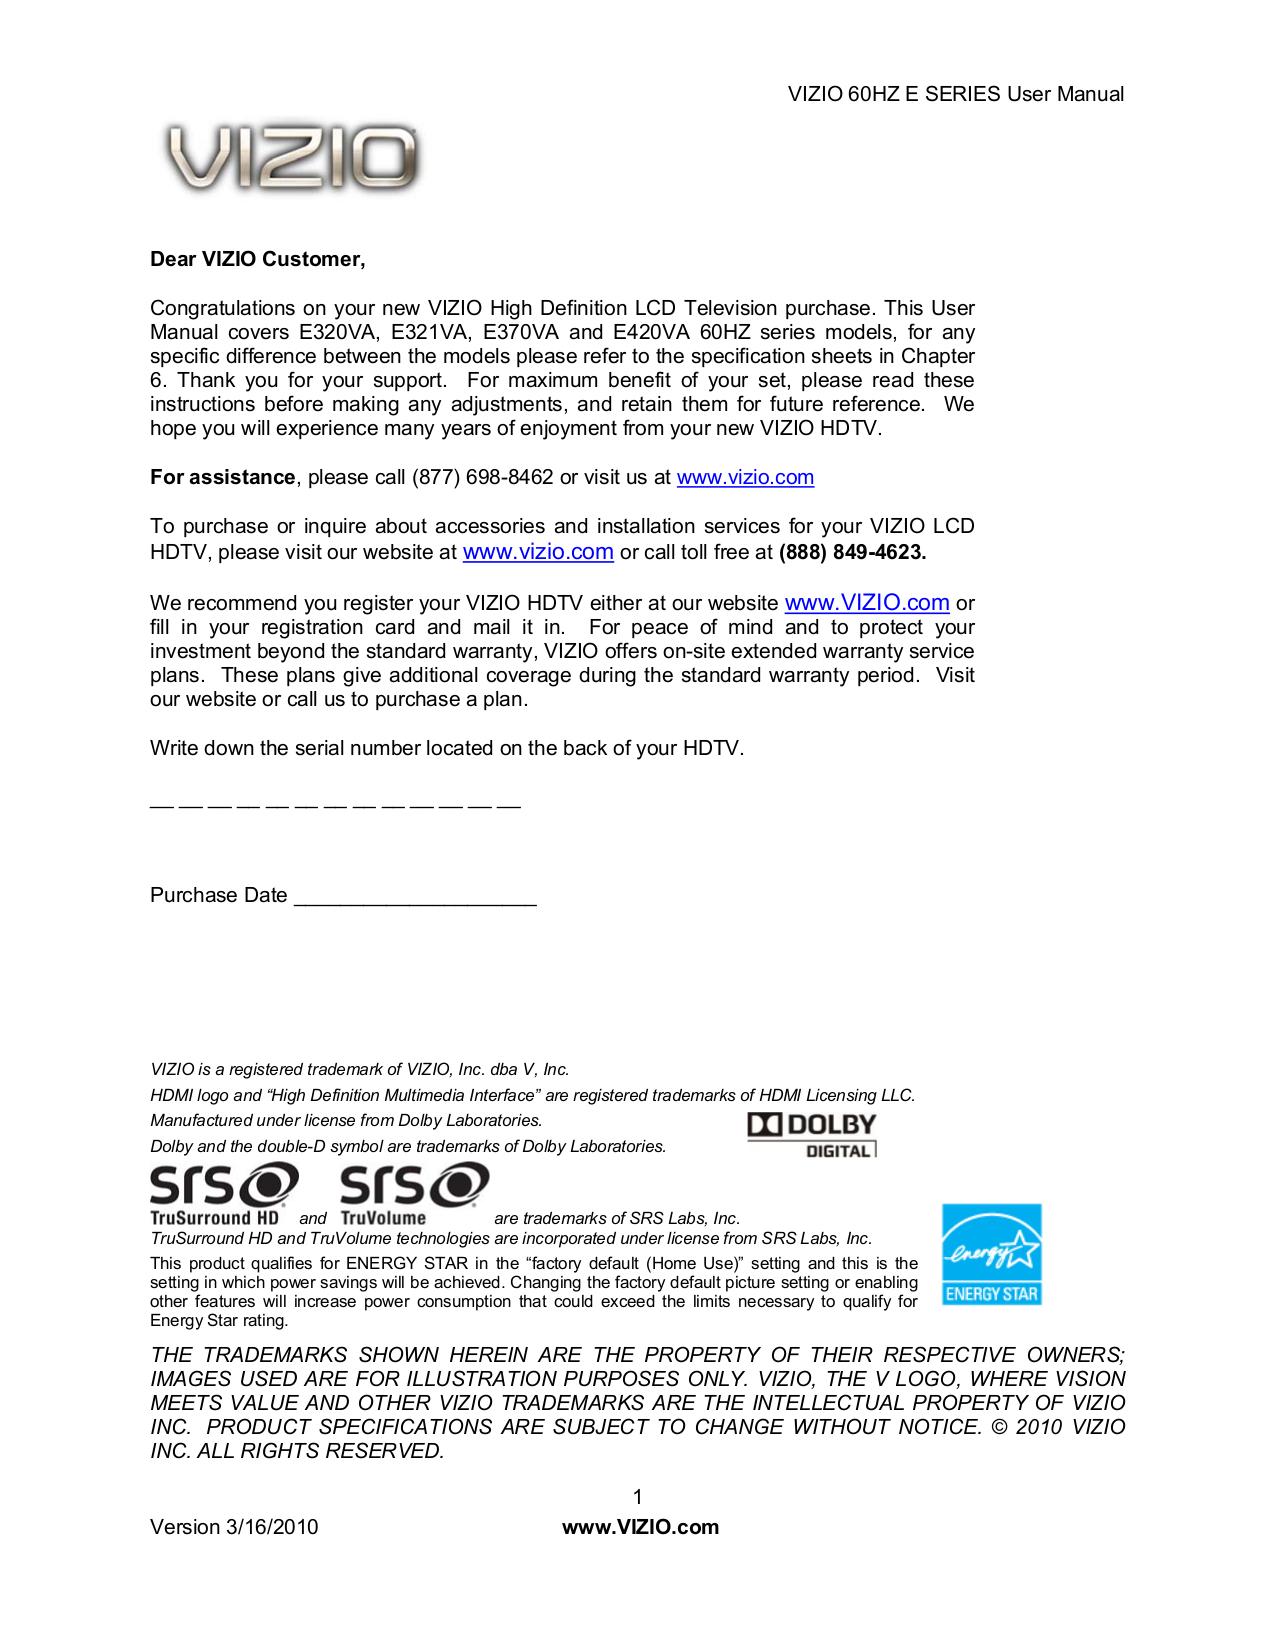 pdf for Lenoxx Radio PR-35M manual